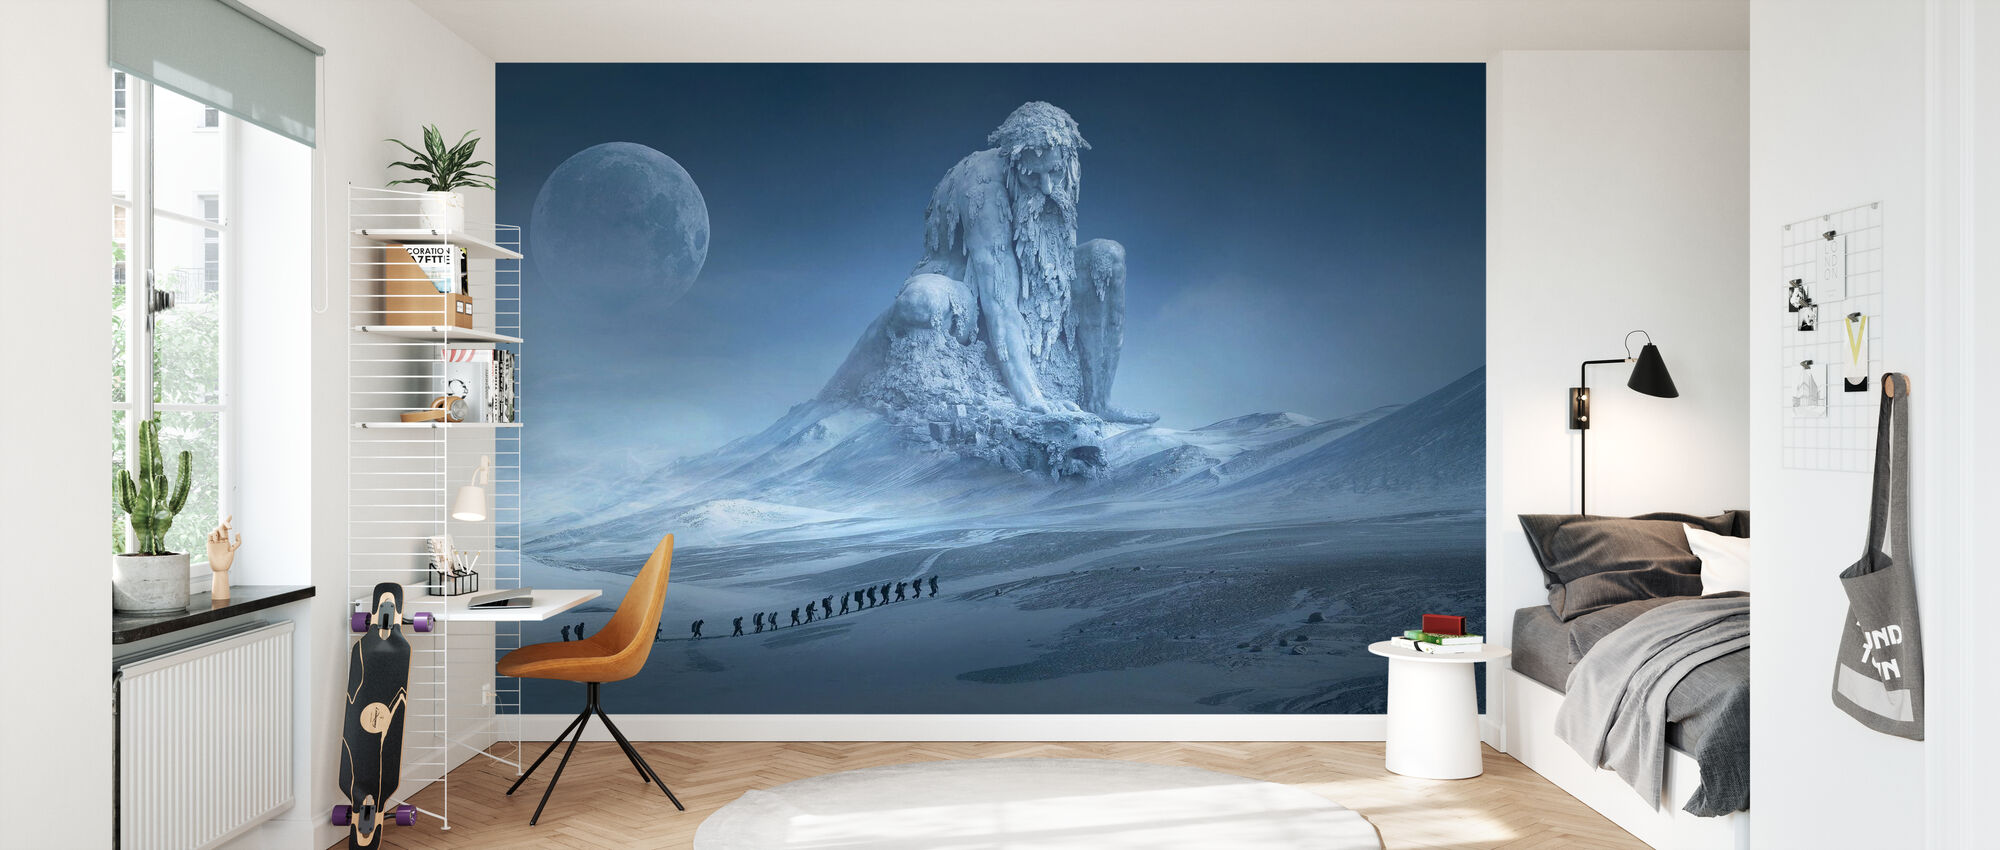 Fantasy Snow Landscape - Wallpaper - Kids Room